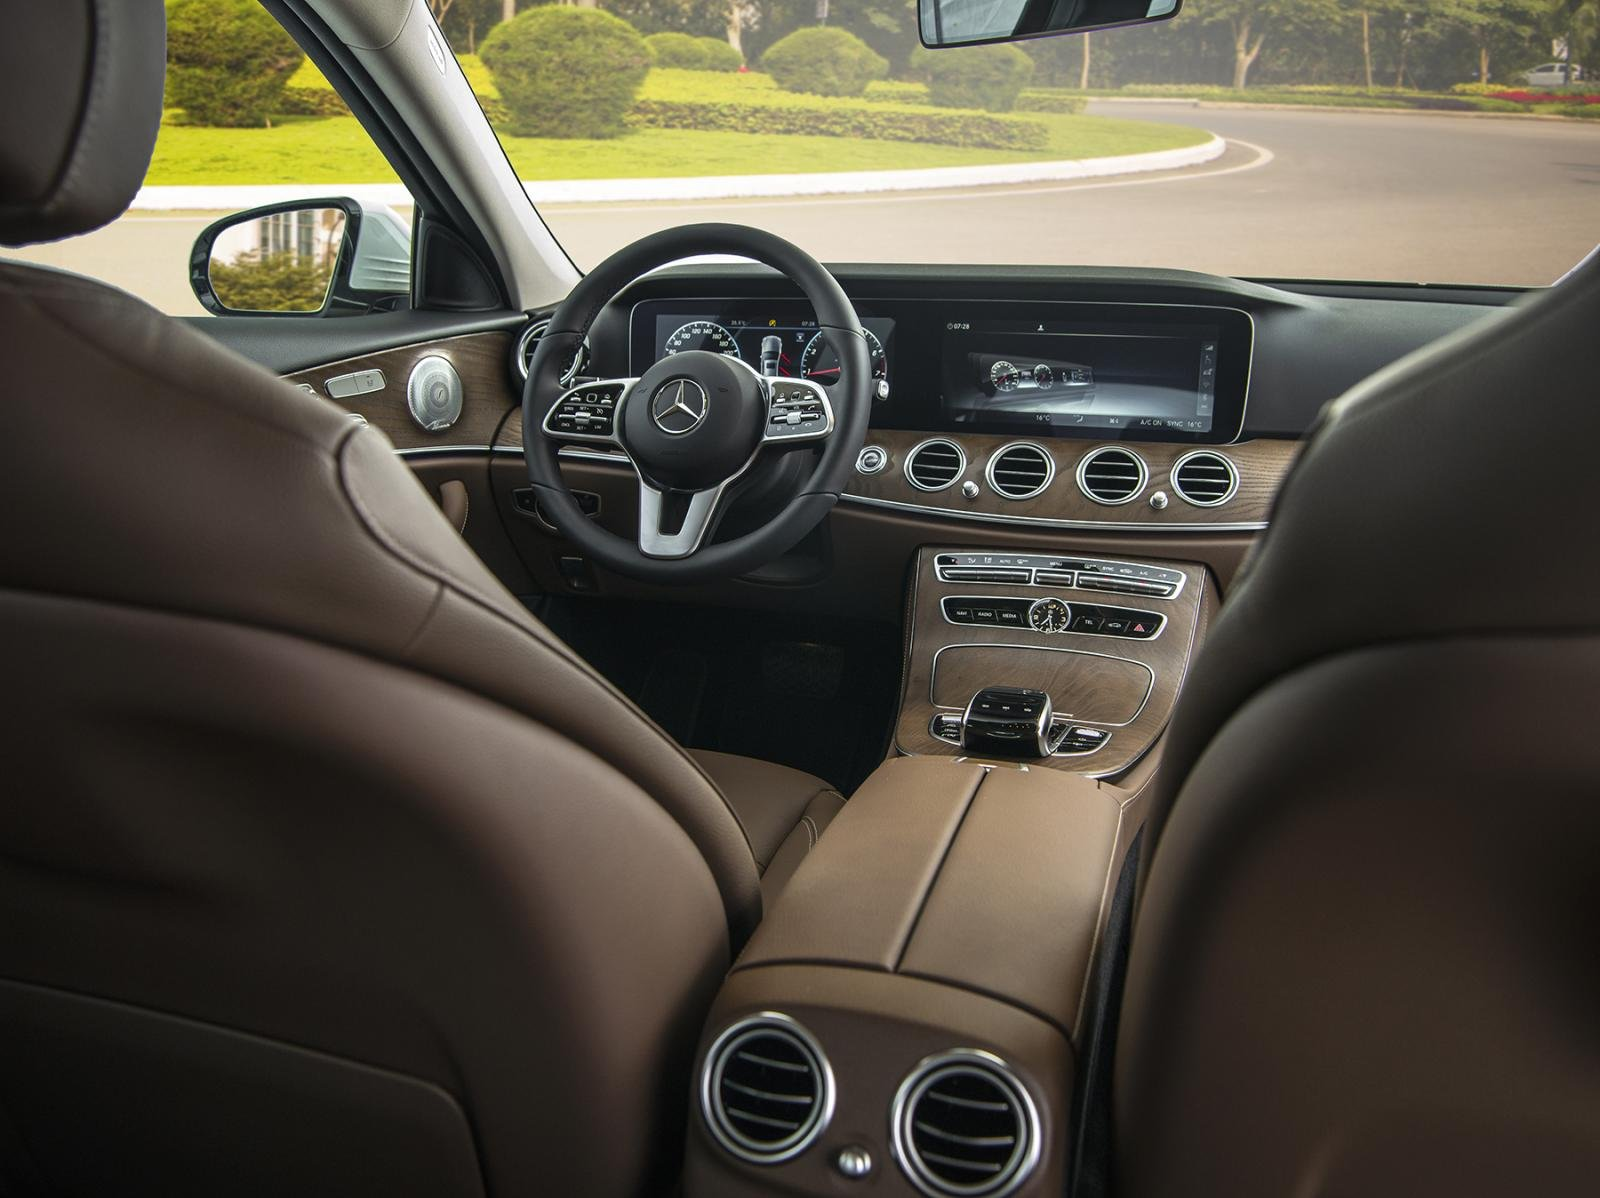 Thông số kỹ thuật xe Mercedes-Benz E 200 Exclusive 2020 a3